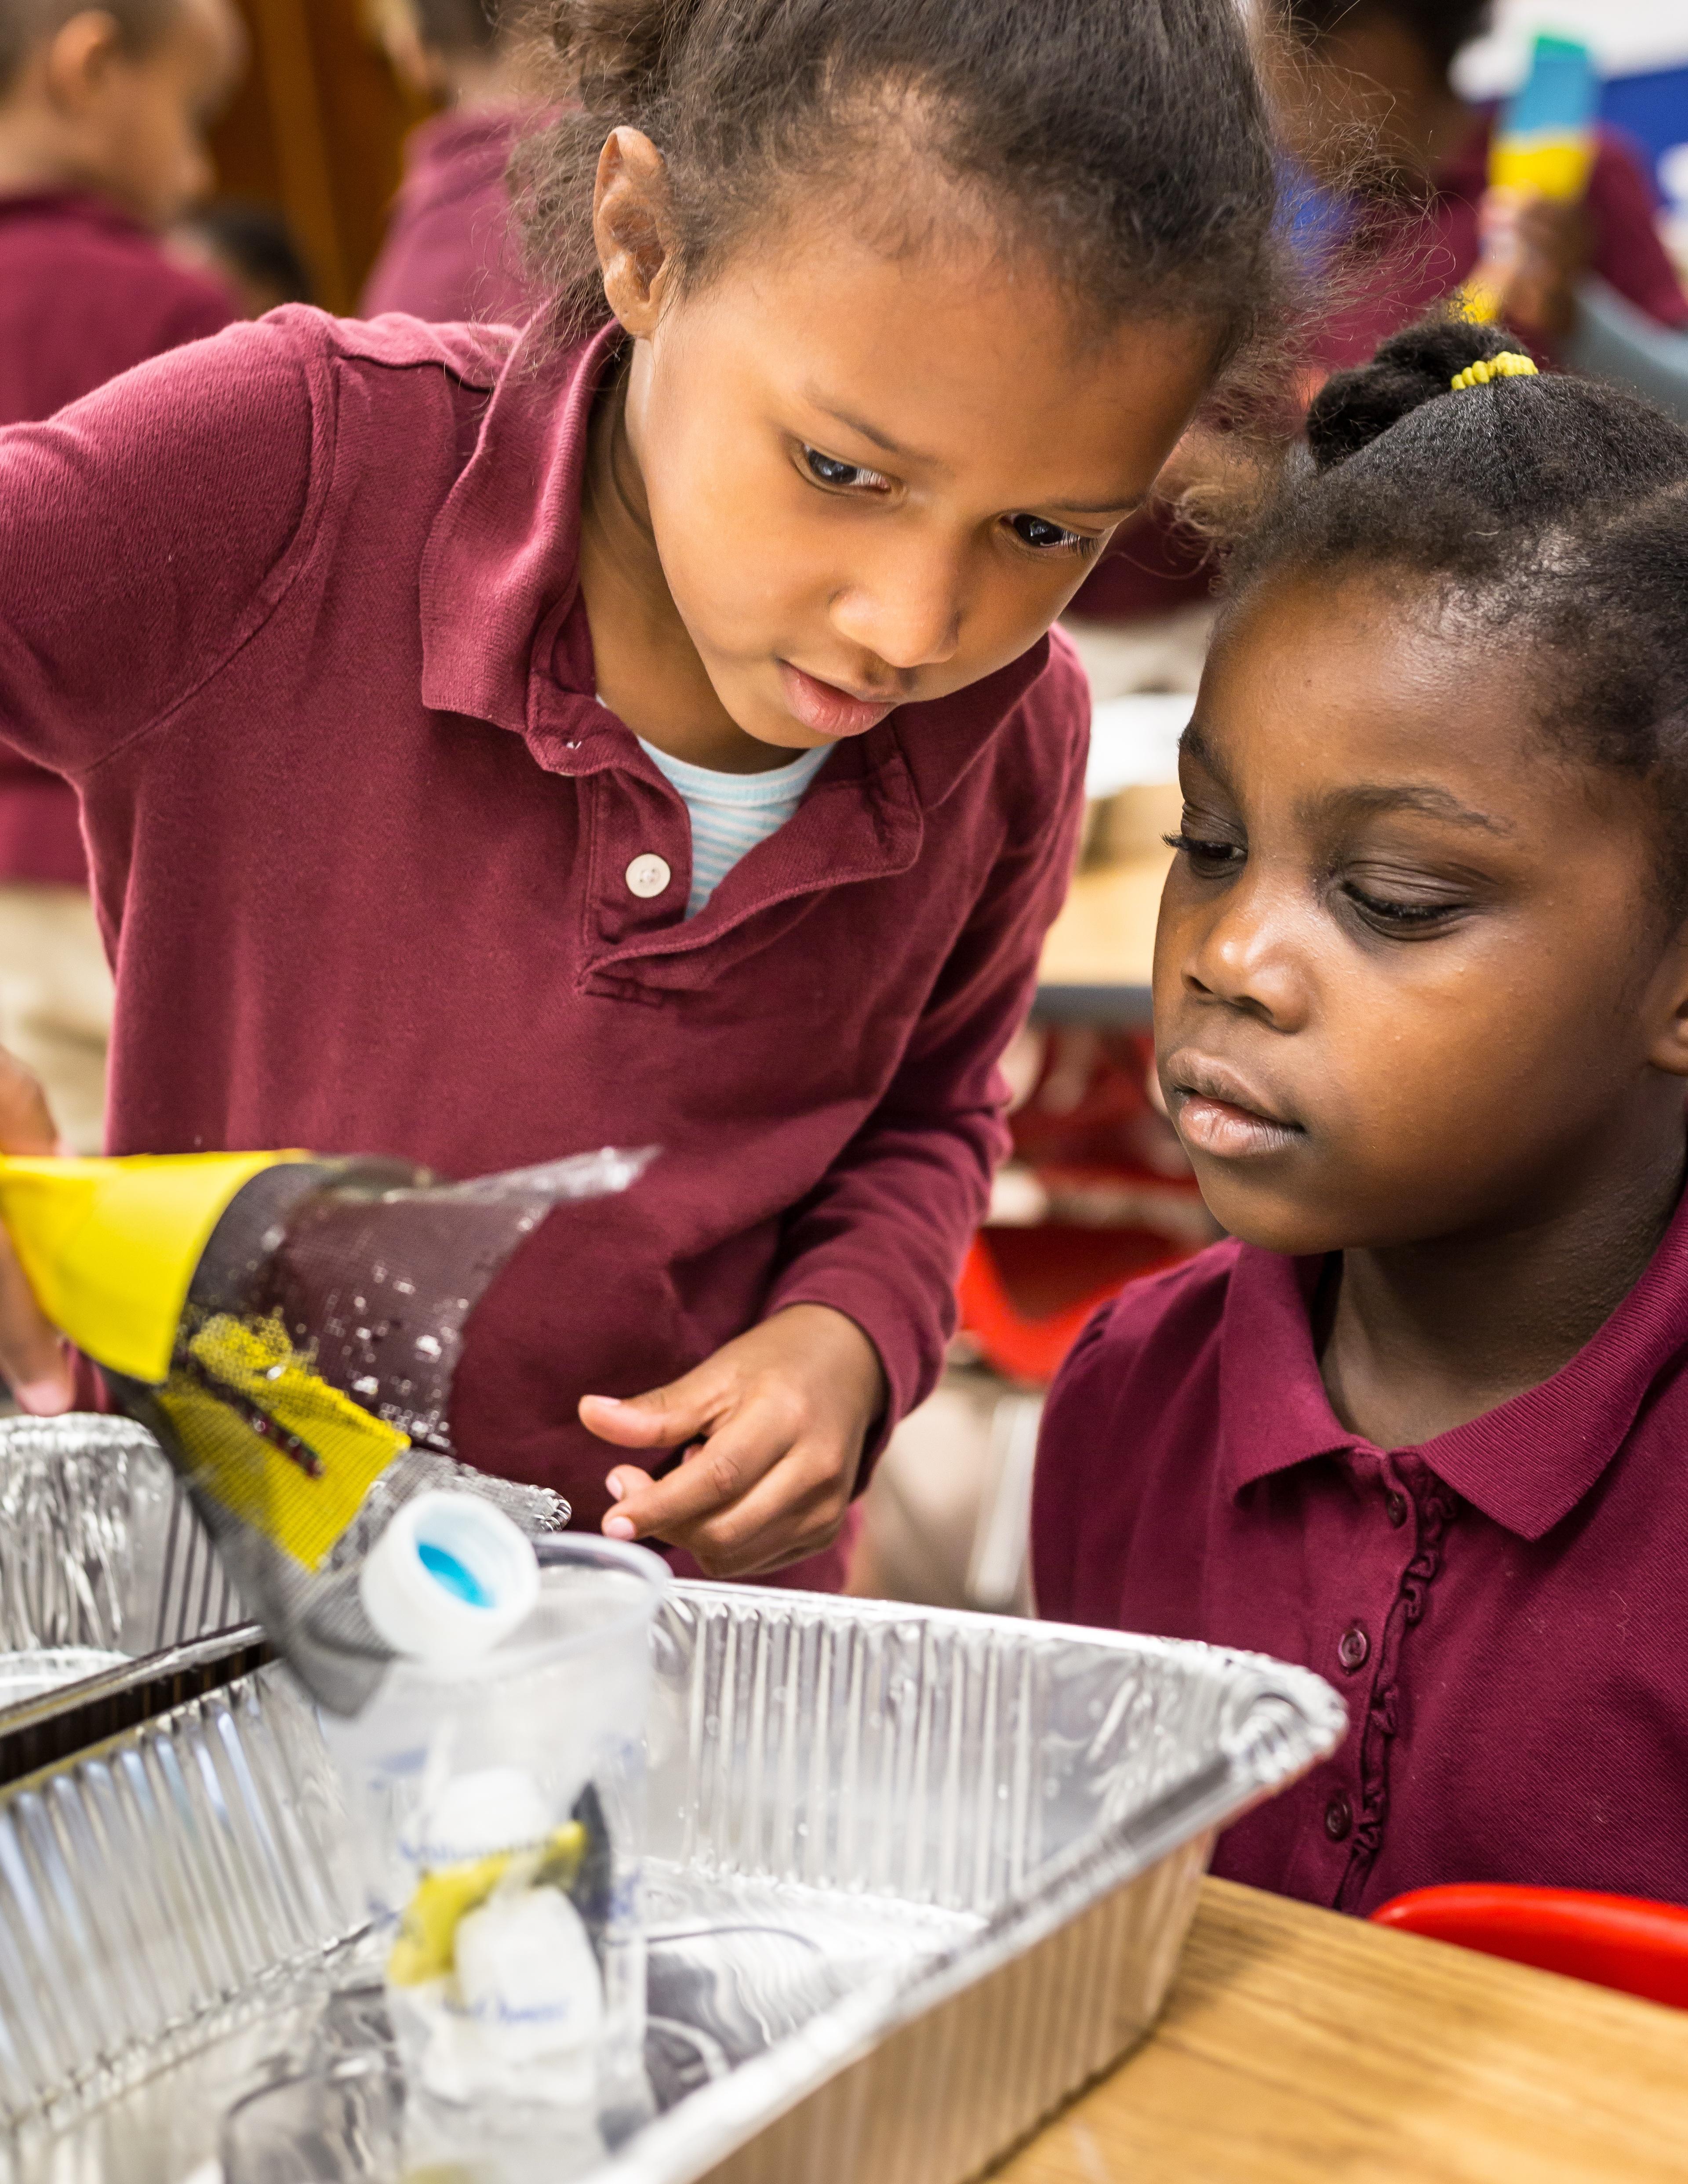 Two kindergarteners work together to engineer